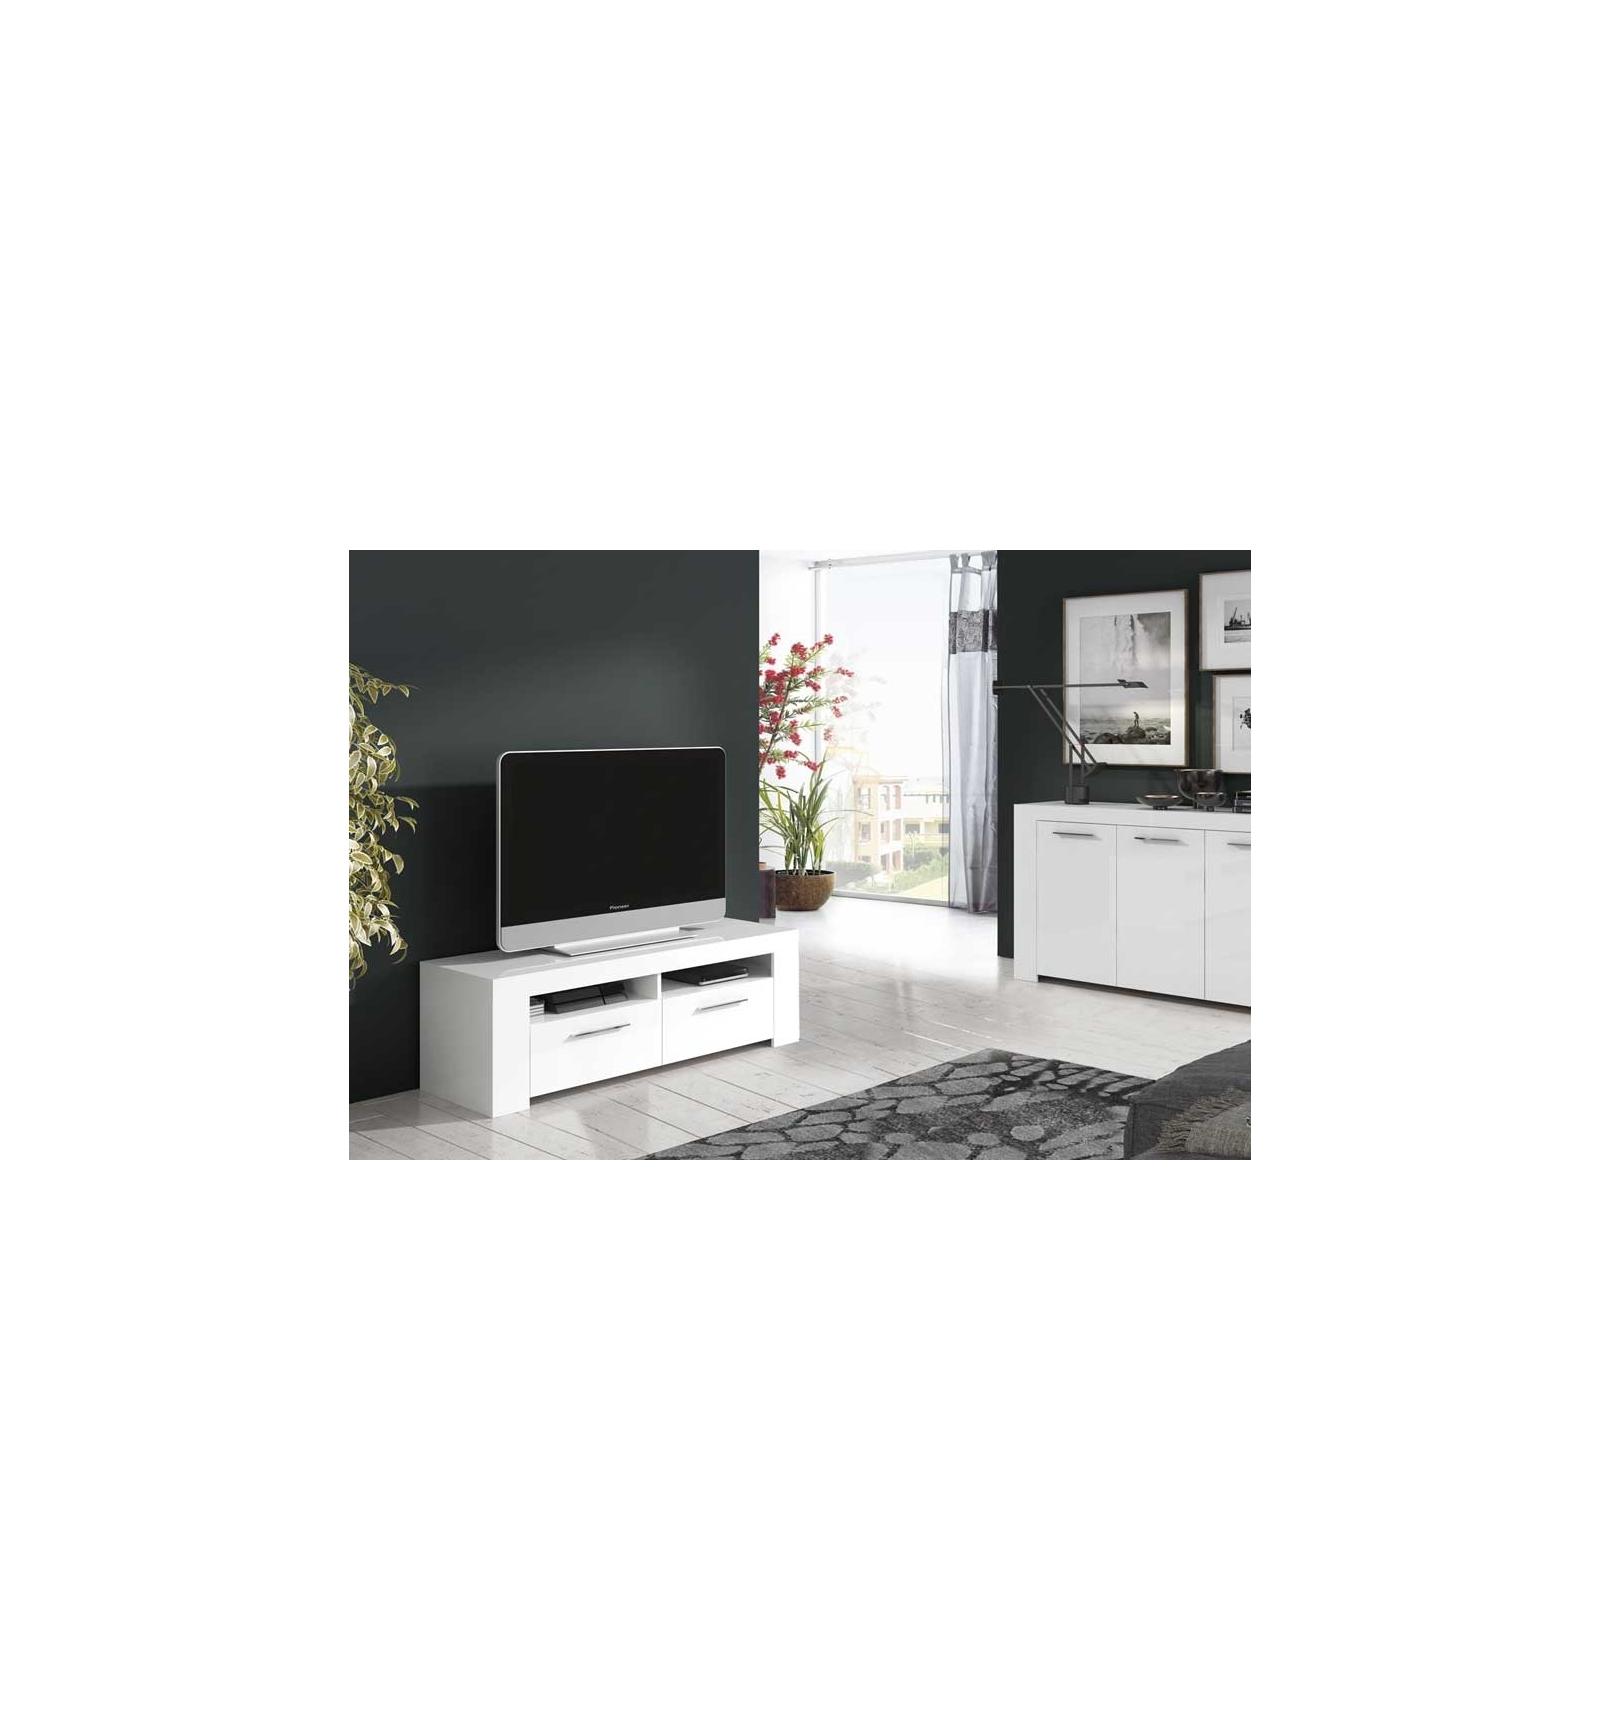 Mueble para tv alodia for Mueble compacto tv